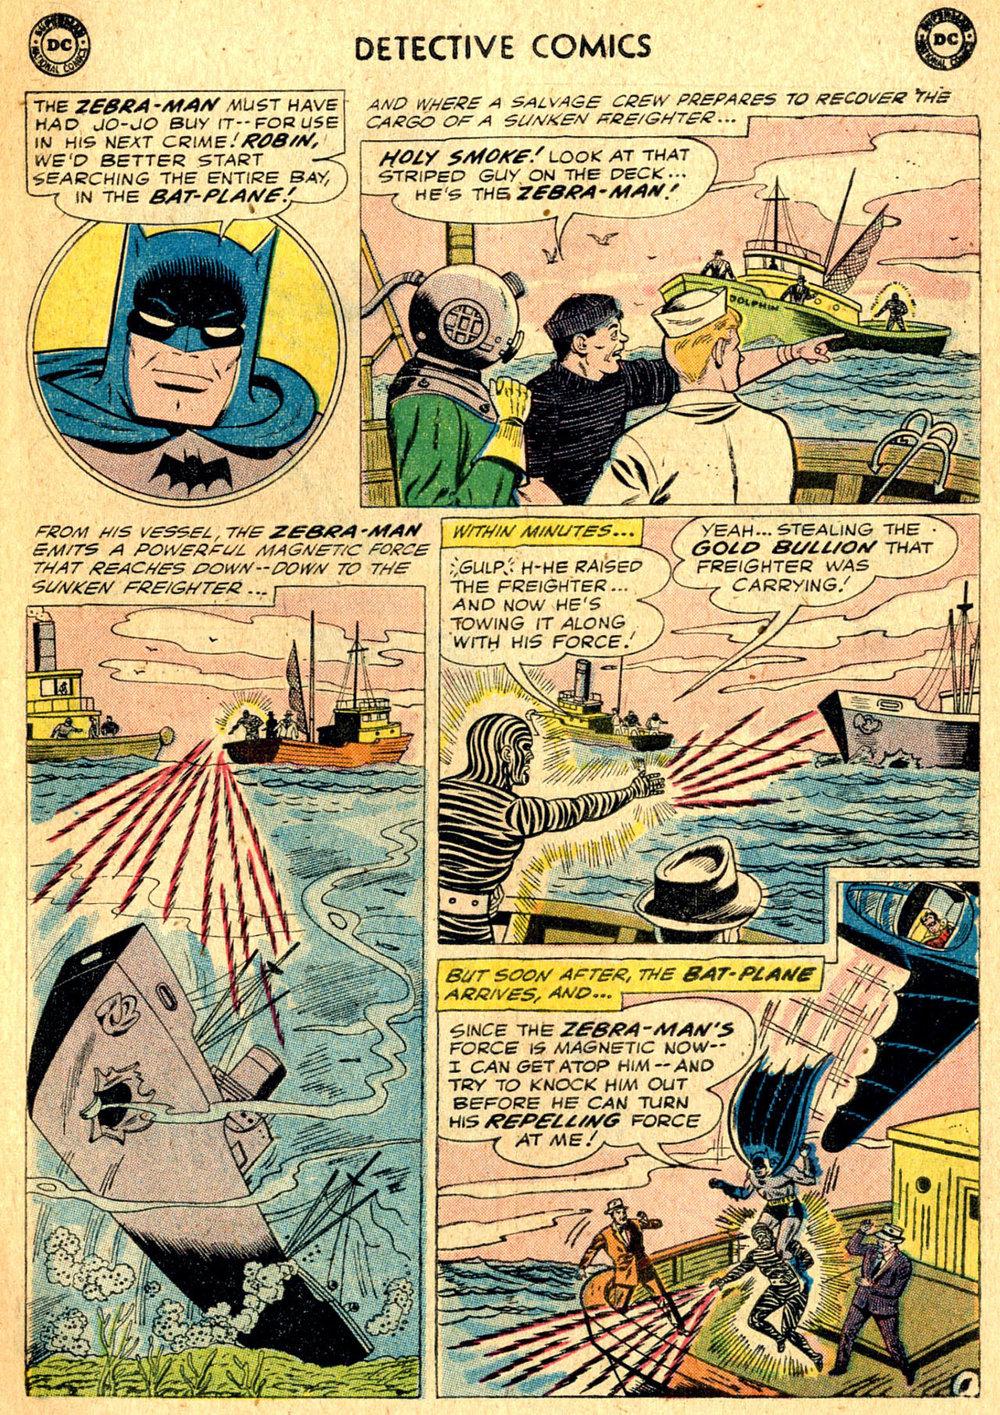 Detective Comics (1937) 275 7.jpg